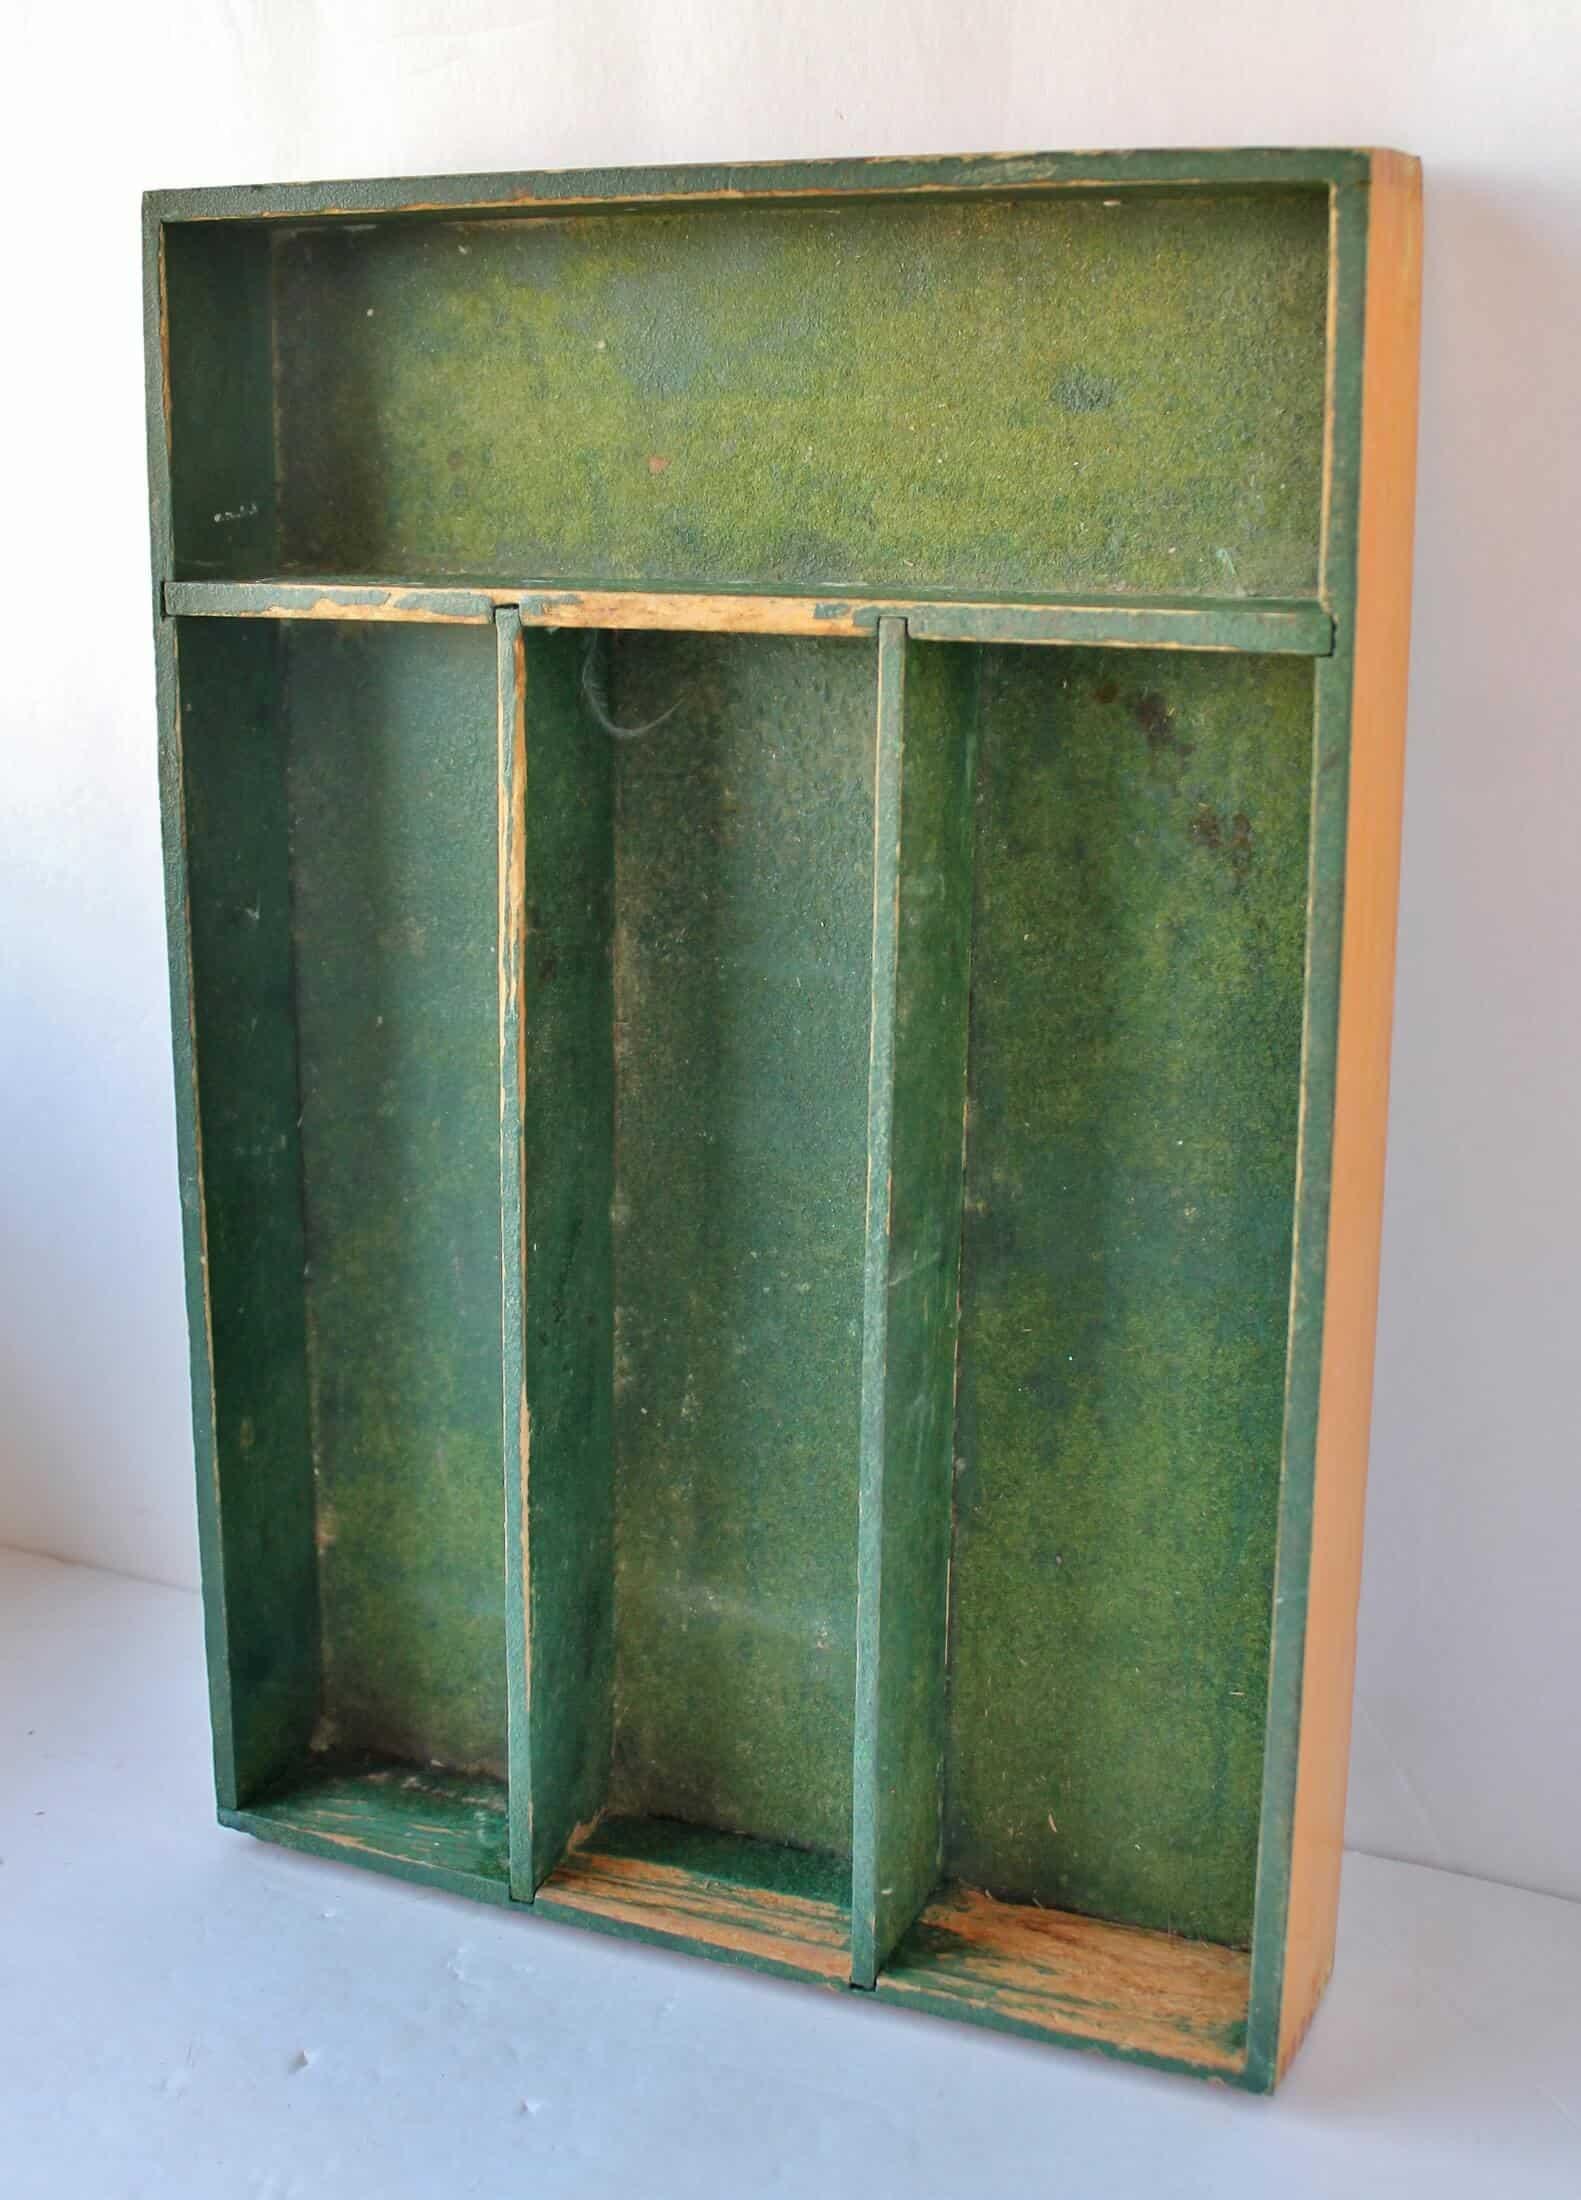 green utensil tray